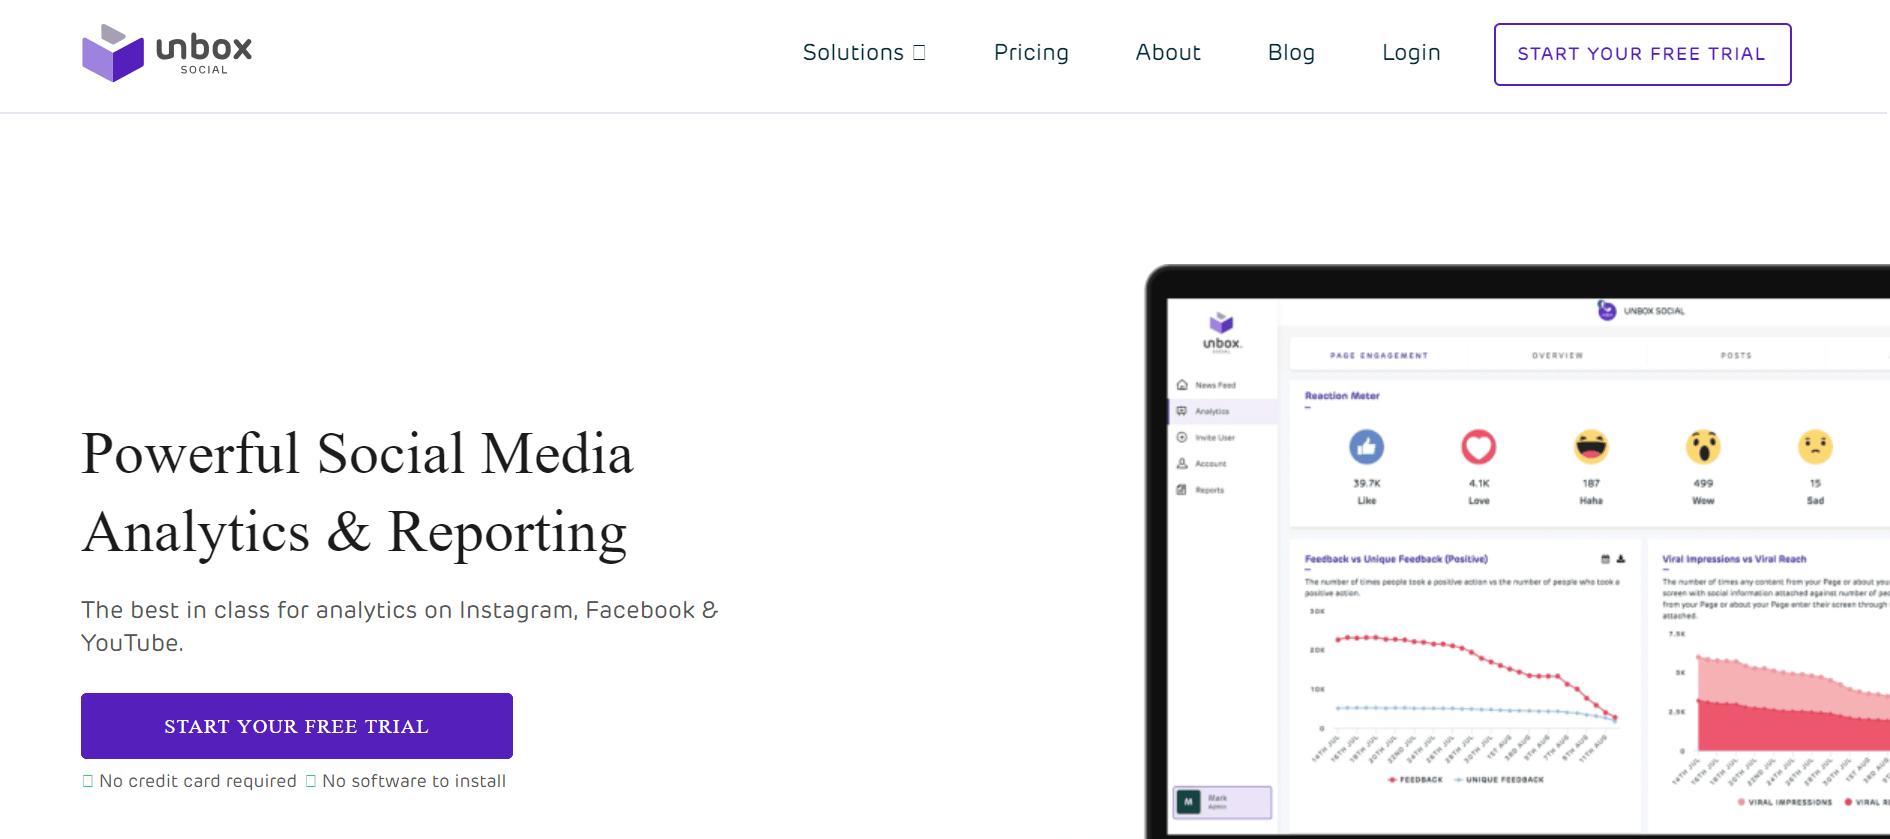 Growth-Marketing-Tools-Unbox-Social